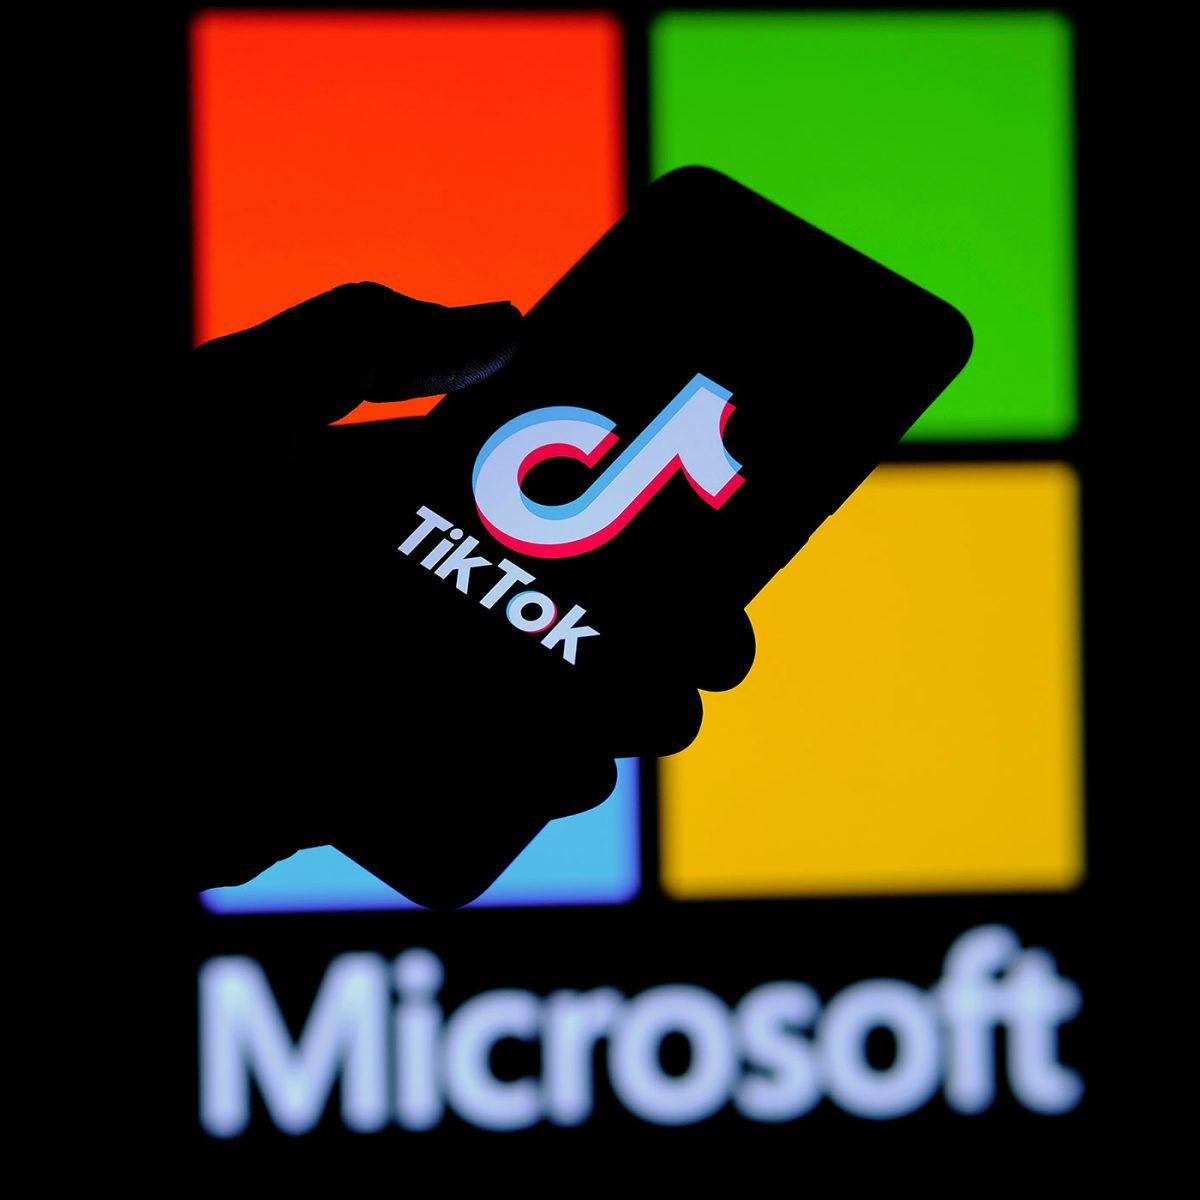 Microsoft Buying TikTok